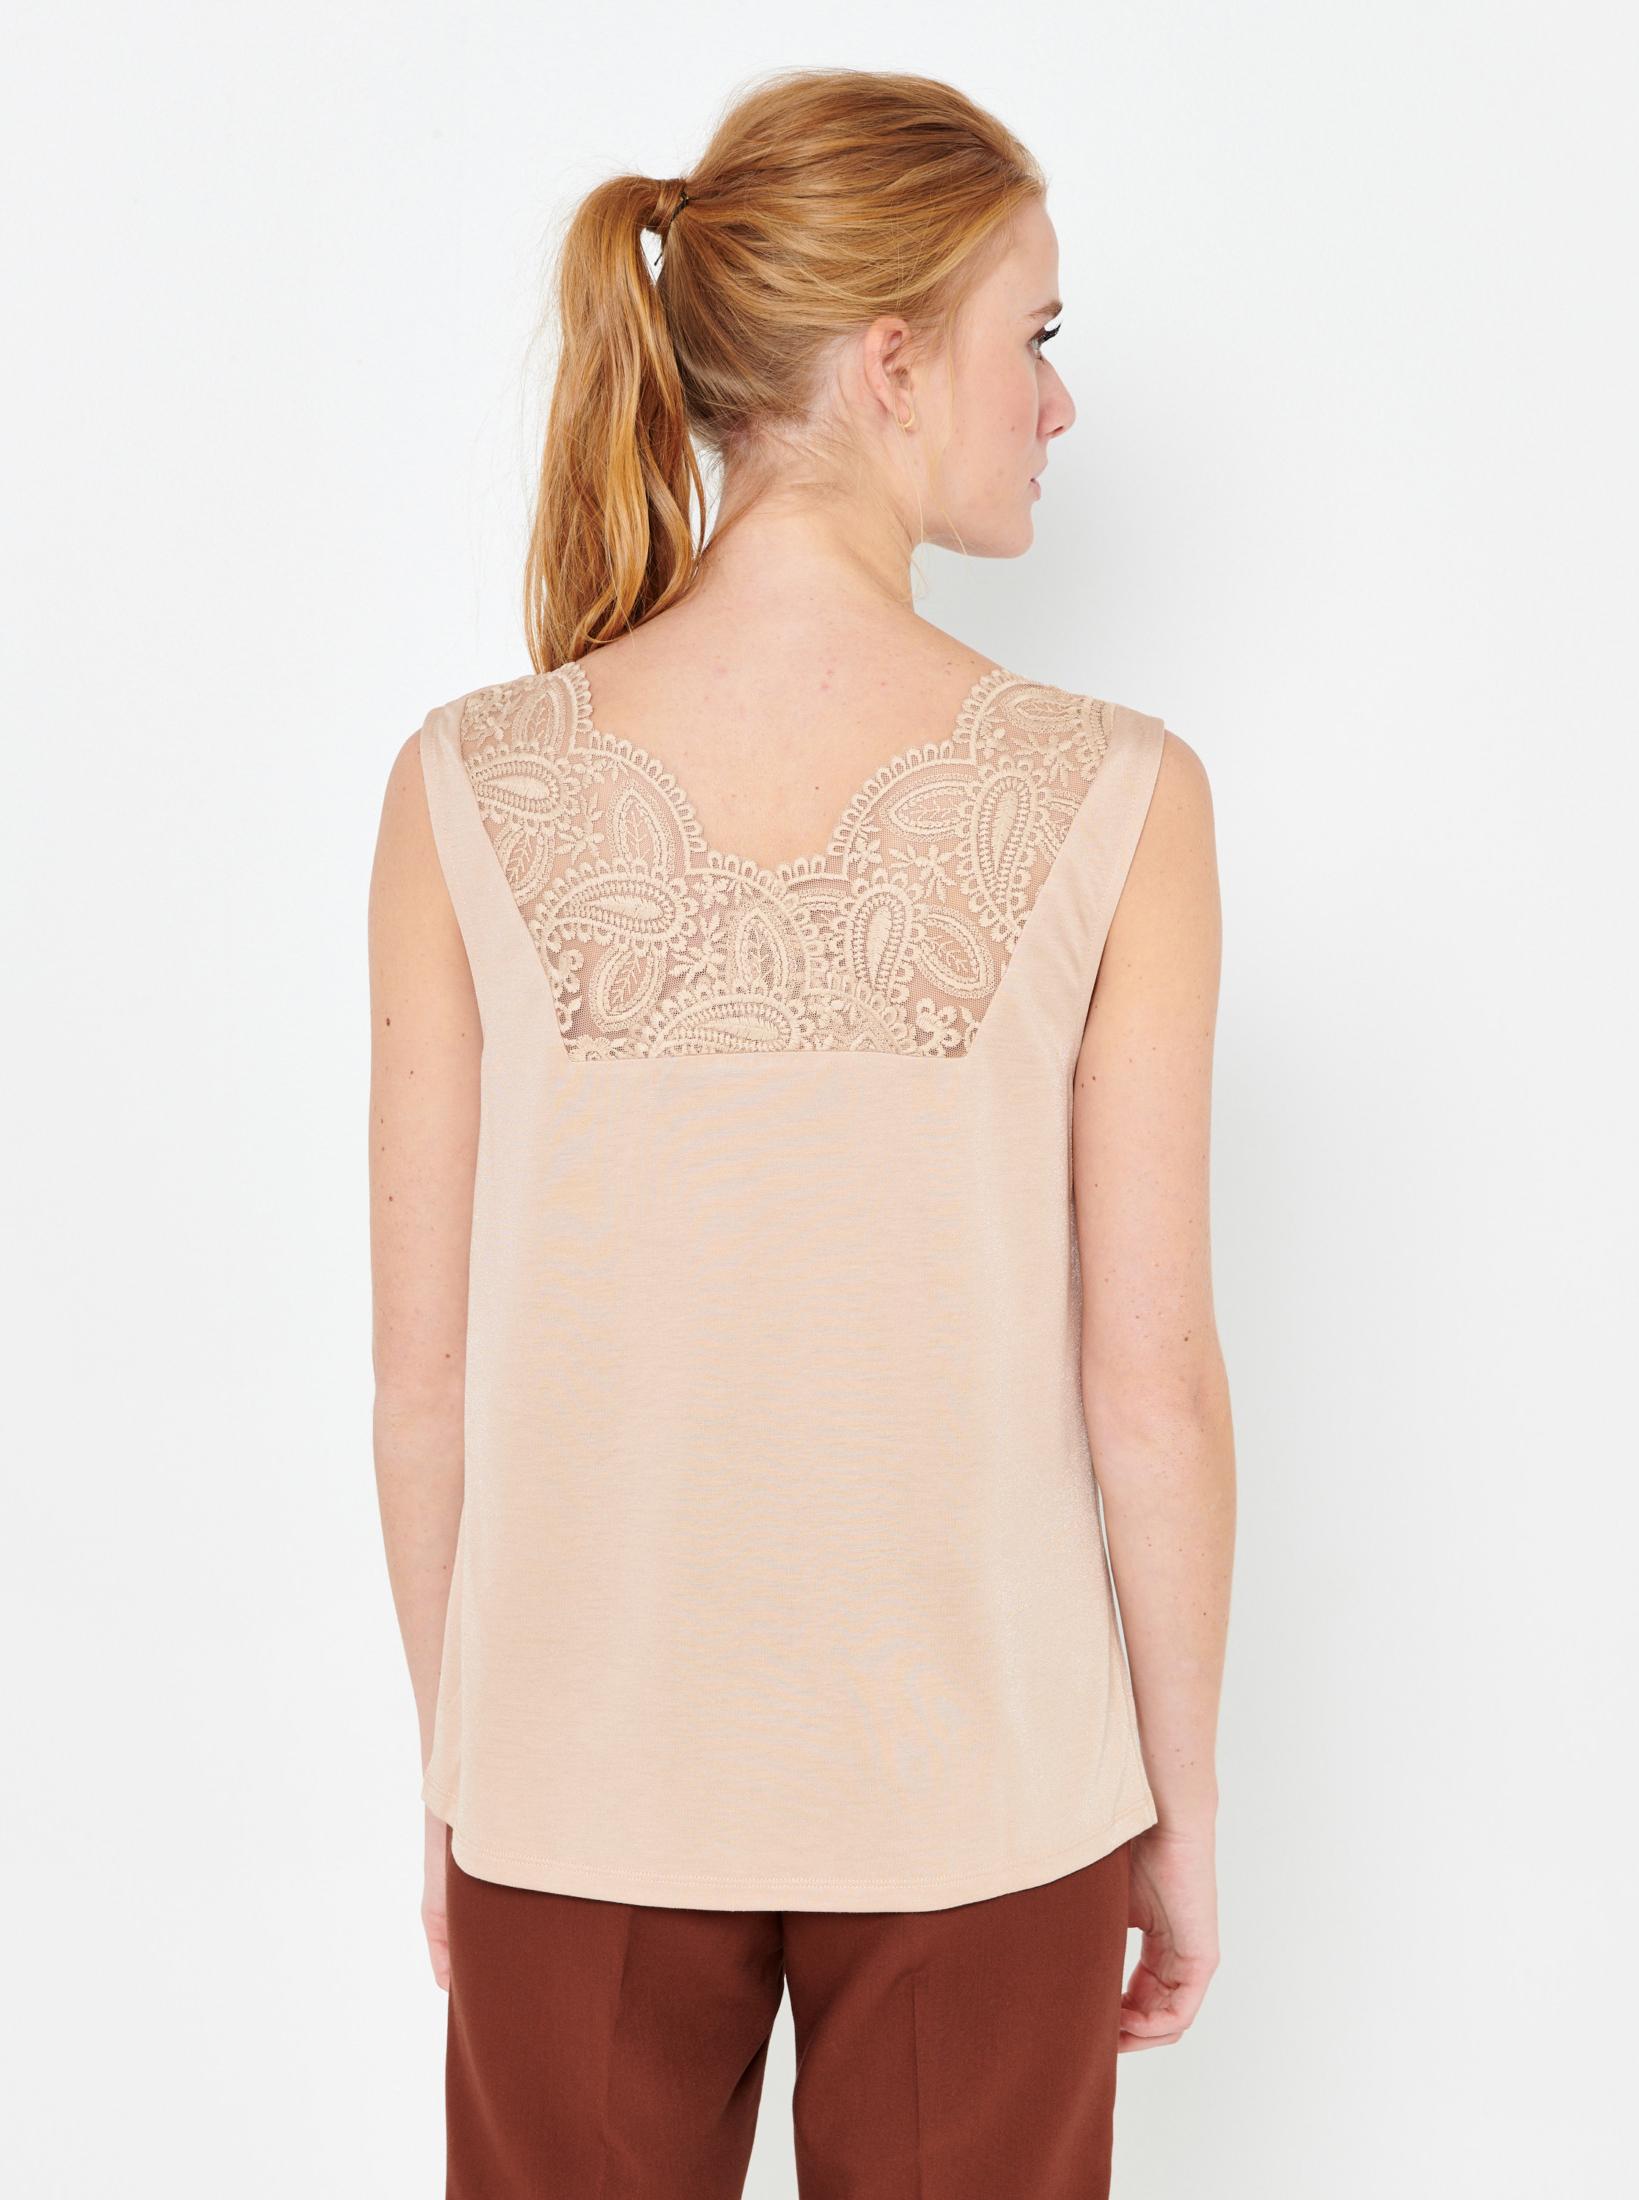 CAMAIEU Women's blouse beige